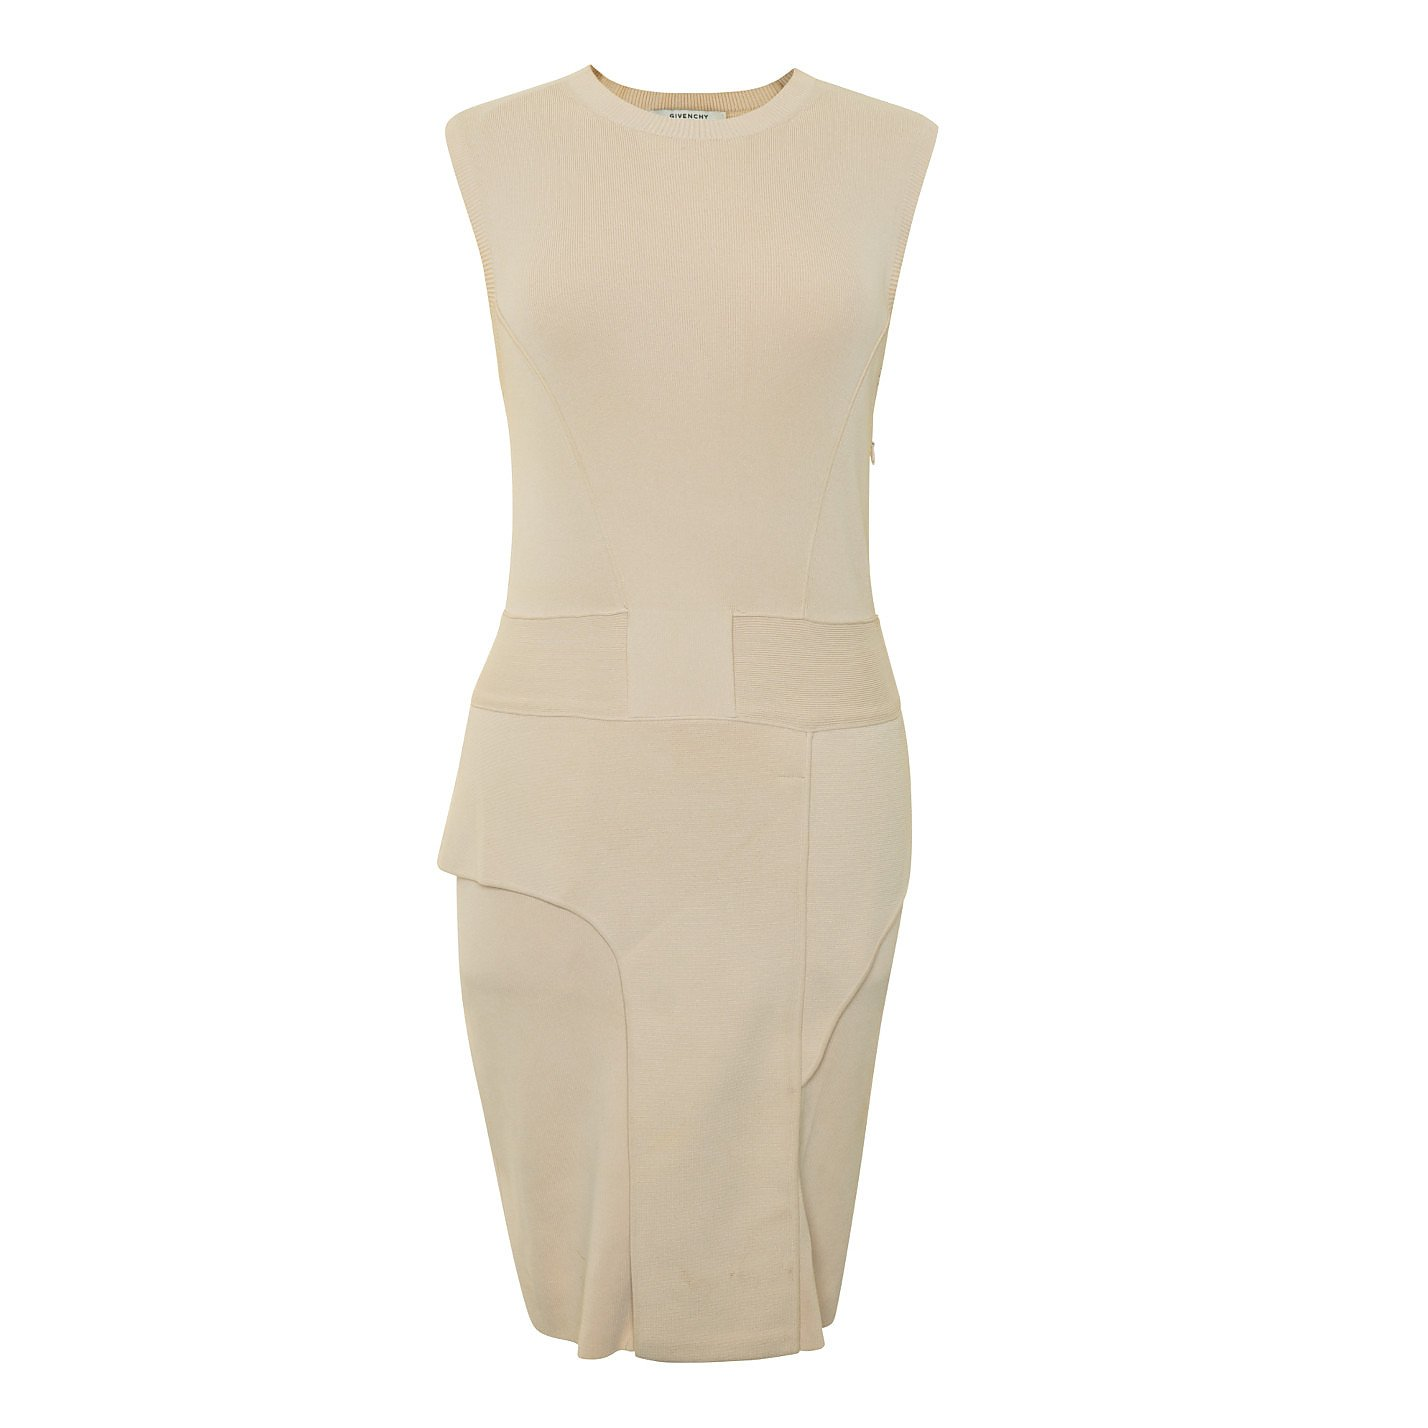 Alexander Wang Sleeveless Bodycon Dress